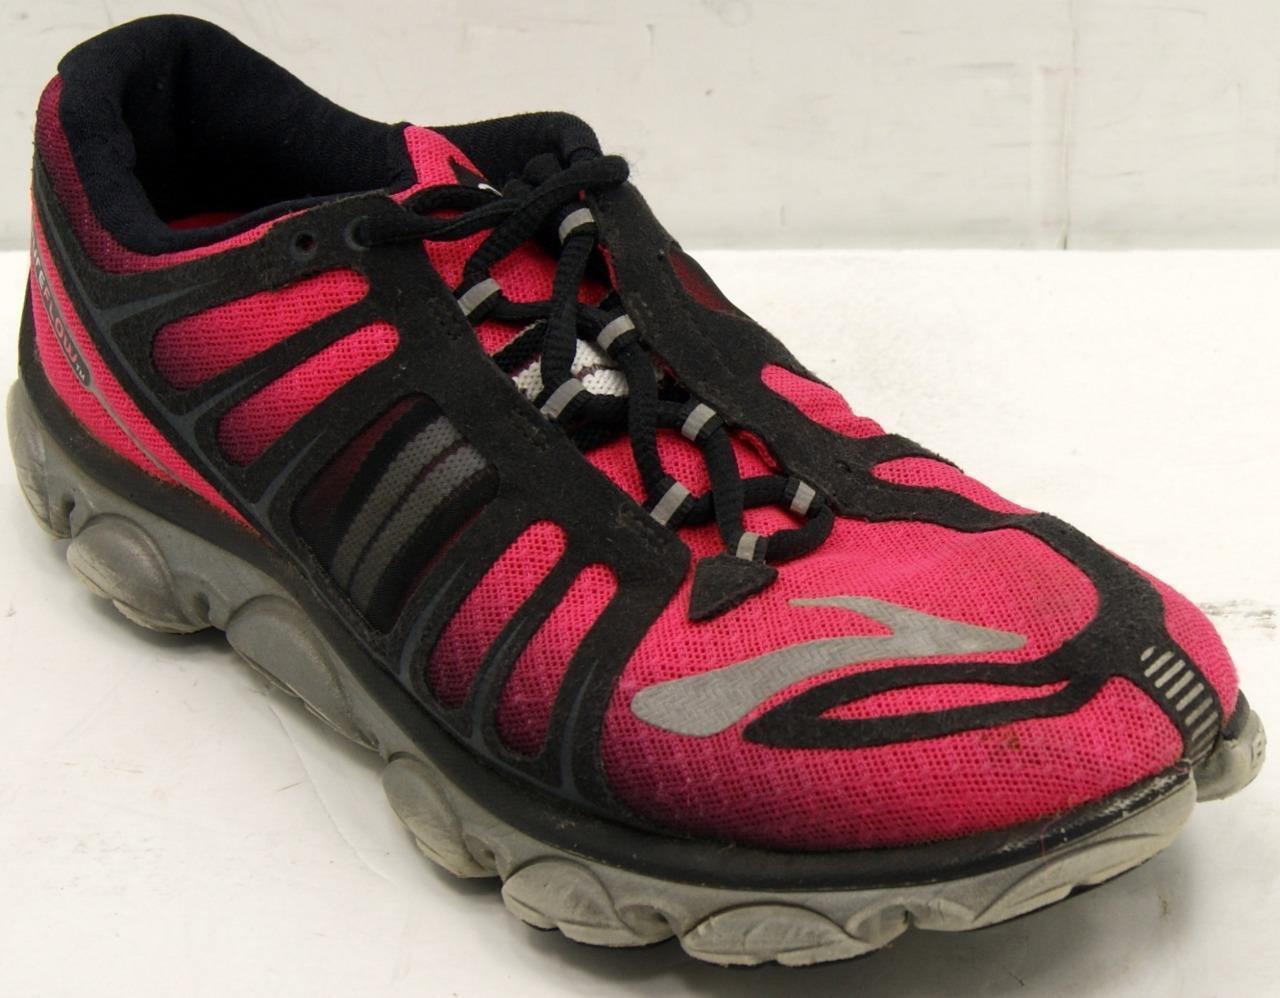 Brooks PureFlow 2 Women's 1201311B613 Pink Black Running shoes Sz 9.5 M